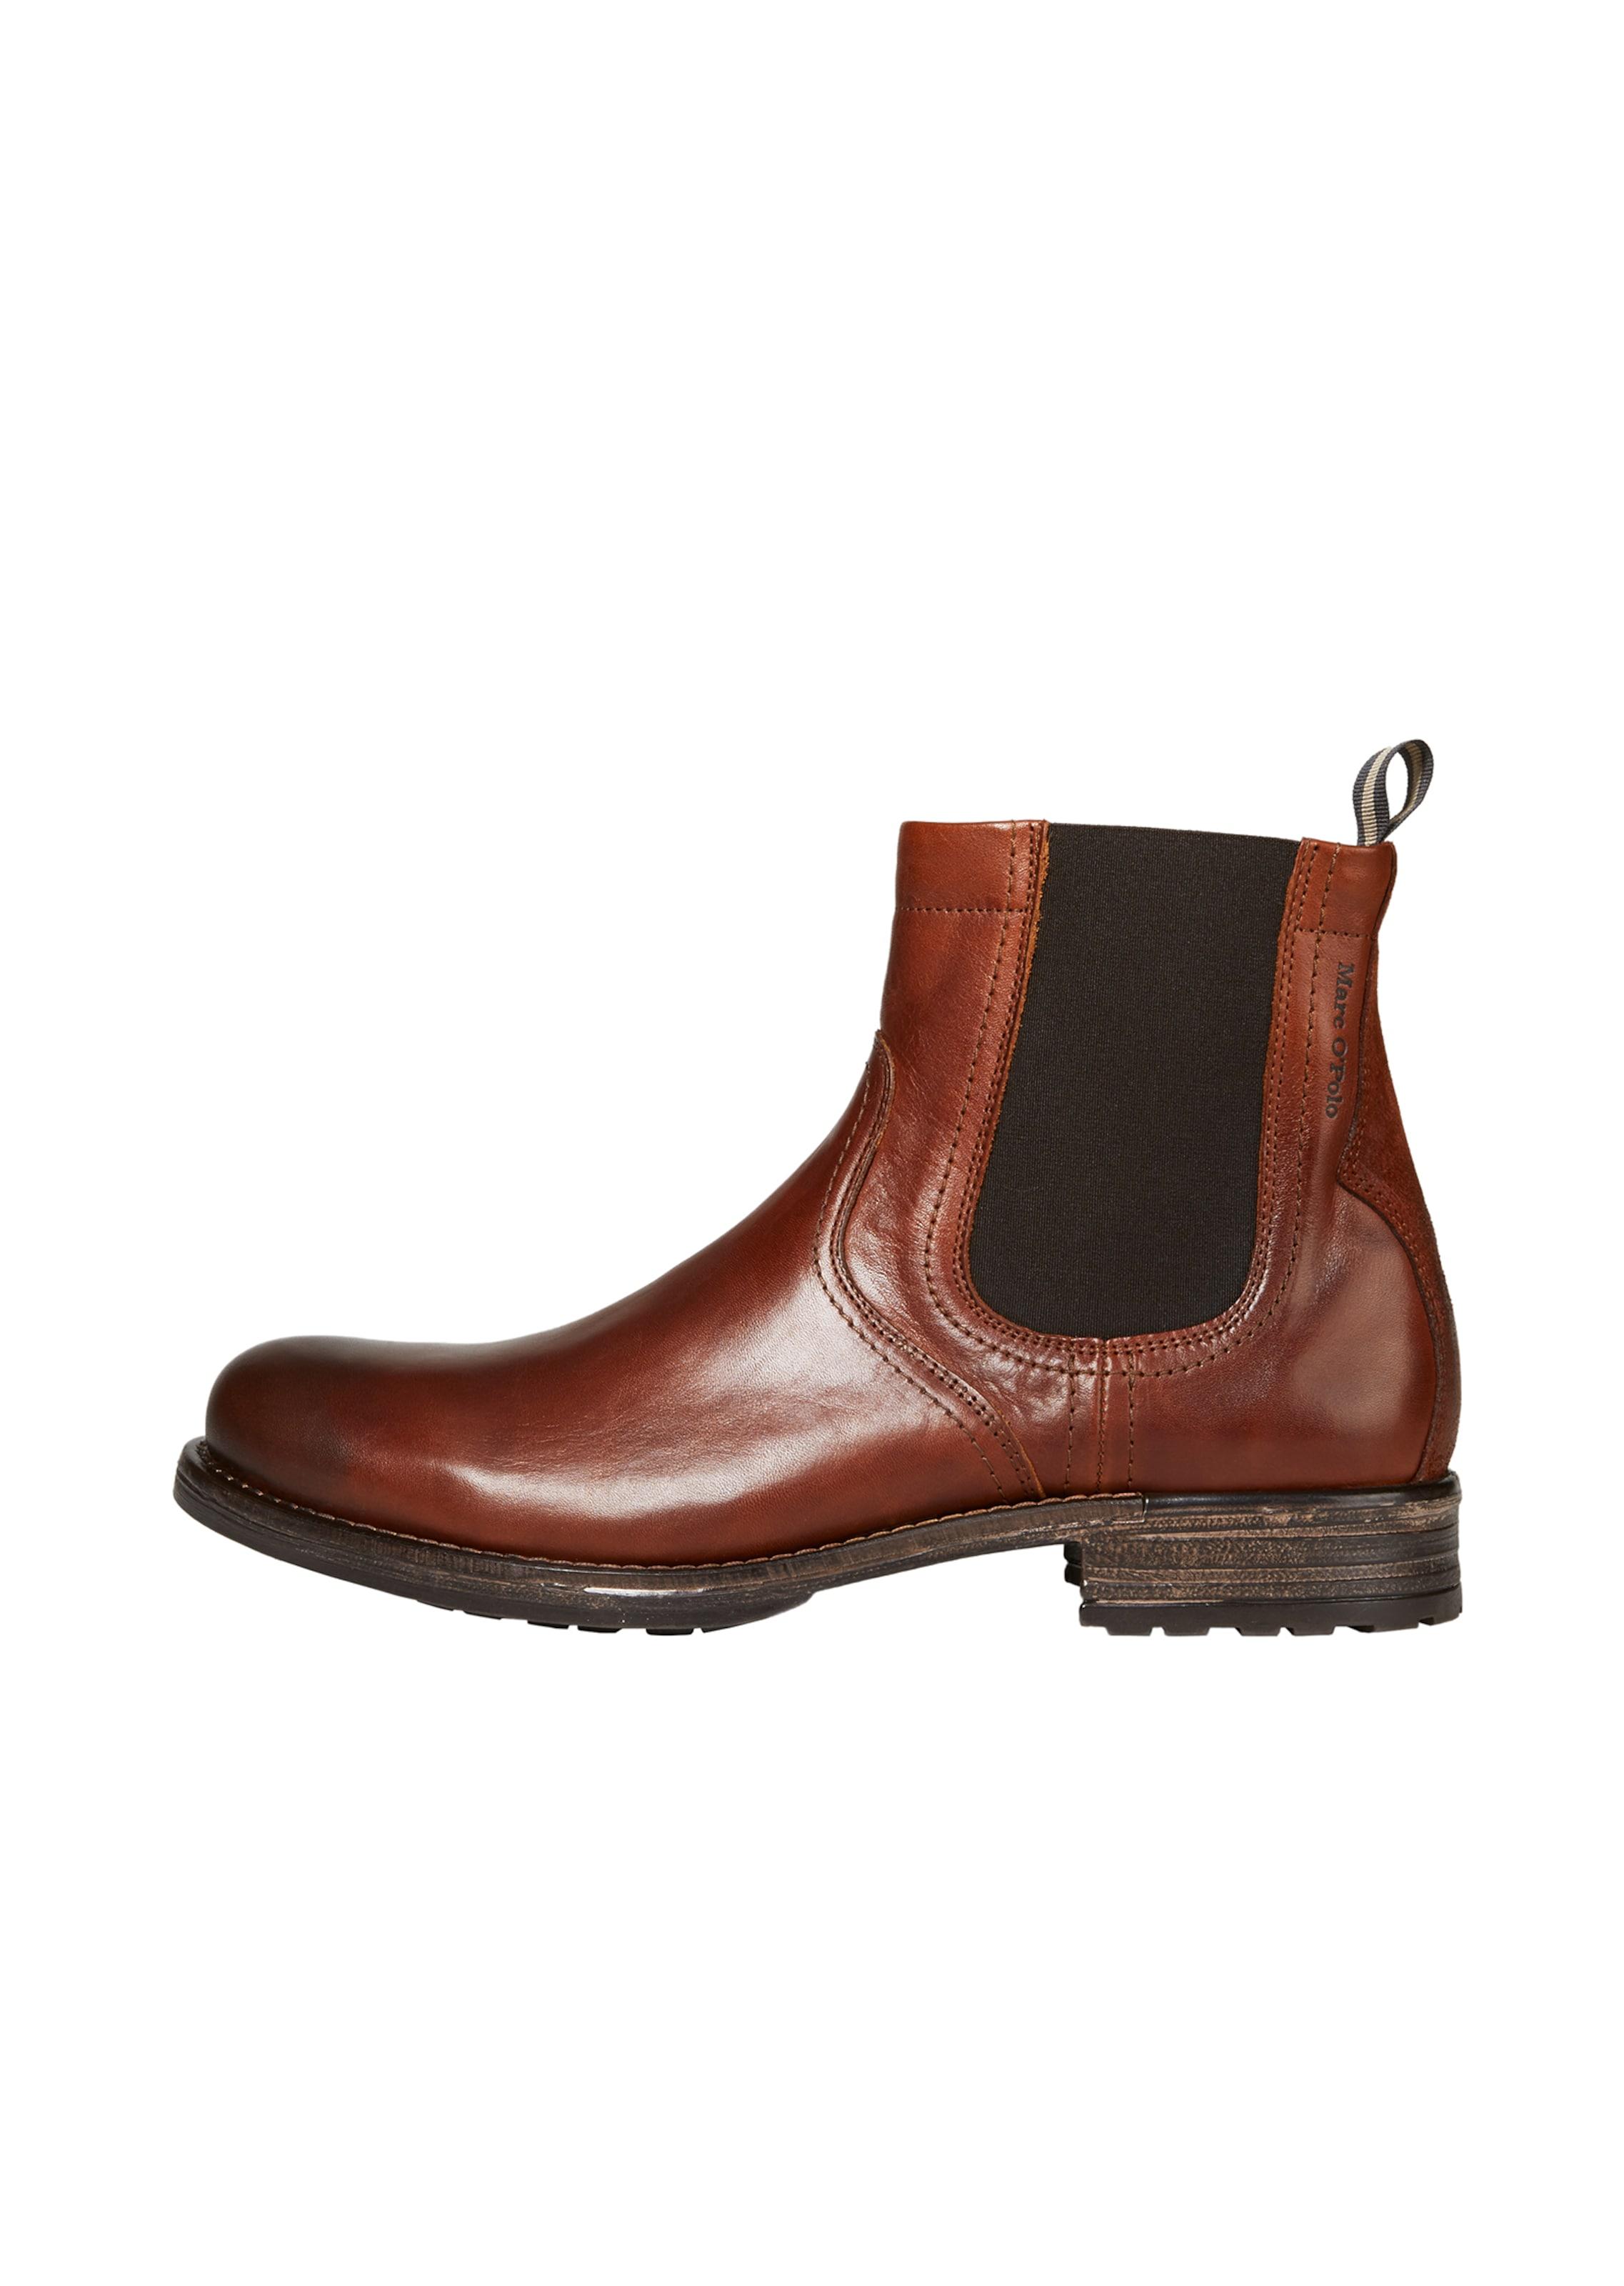 In RostbraunDunkelbraun Marc O'polo Chelsea Boots 9eDWIYEH2